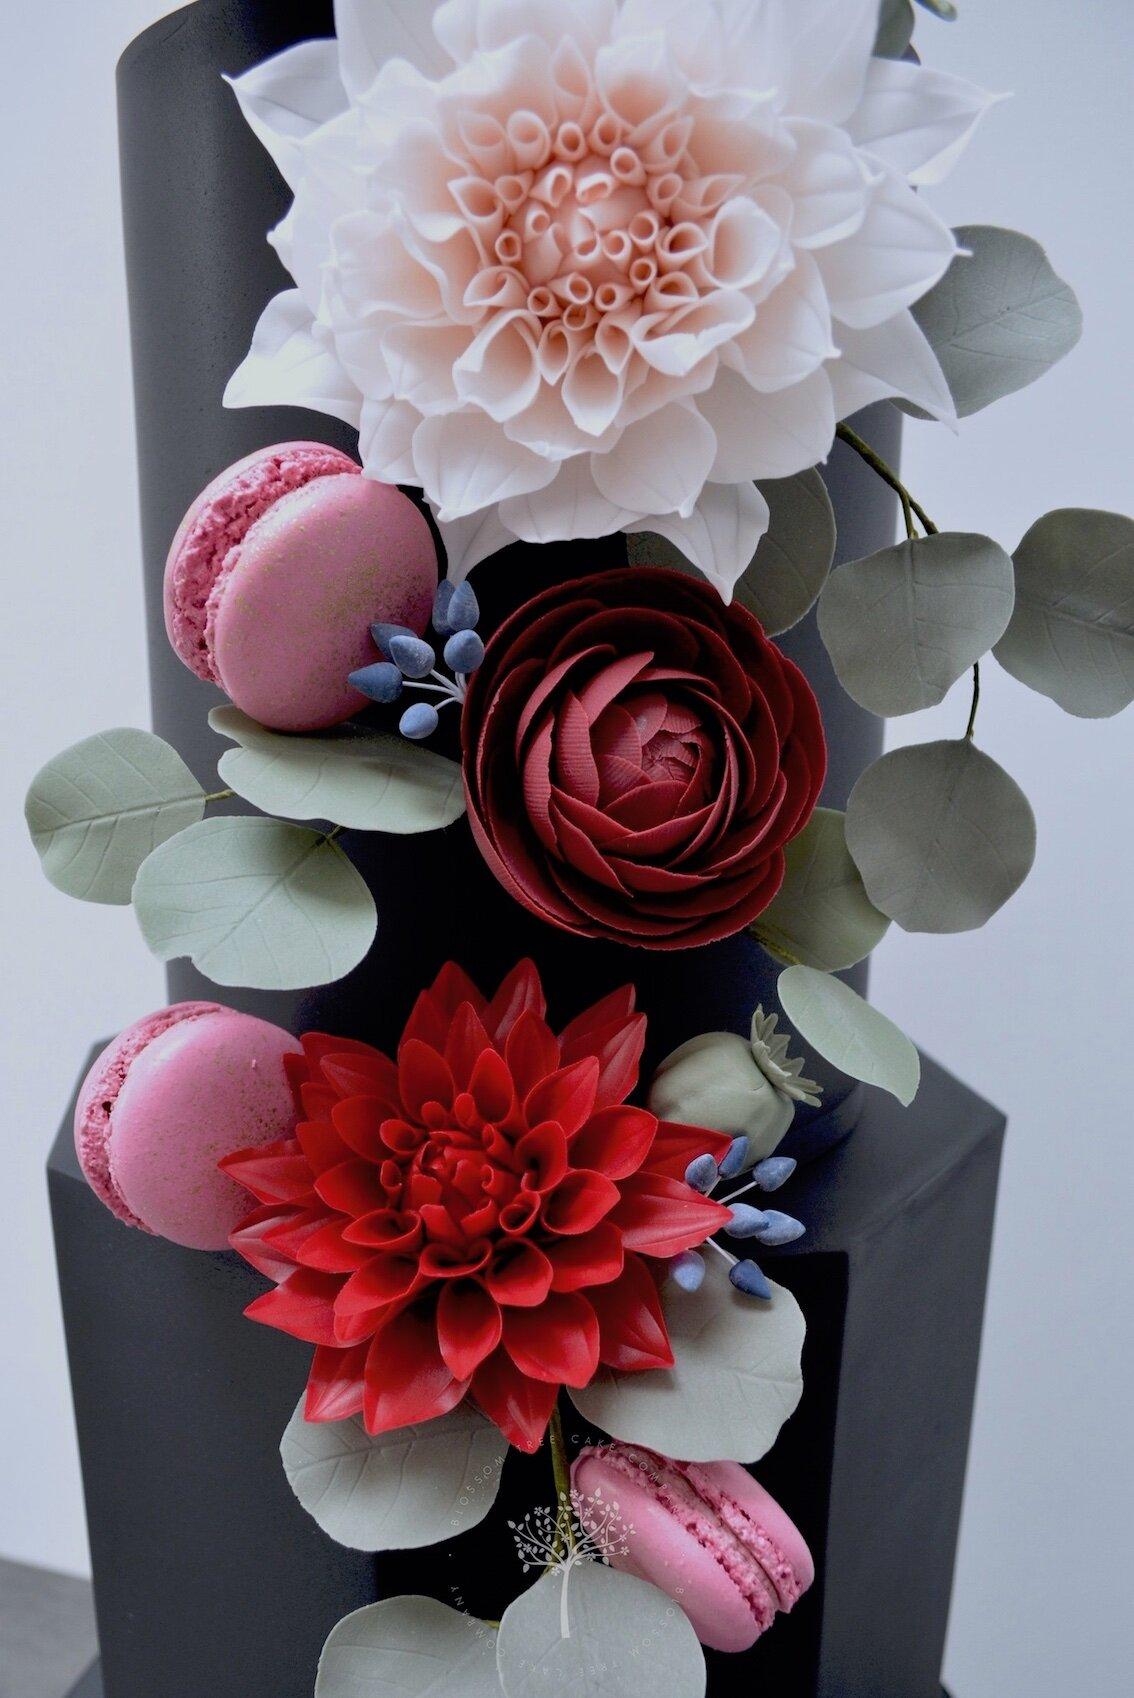 Autumn Blooms wedding cake by Blossom Tree Cake Company Harrogate North Yorkshire - suagr dahlias.jpg